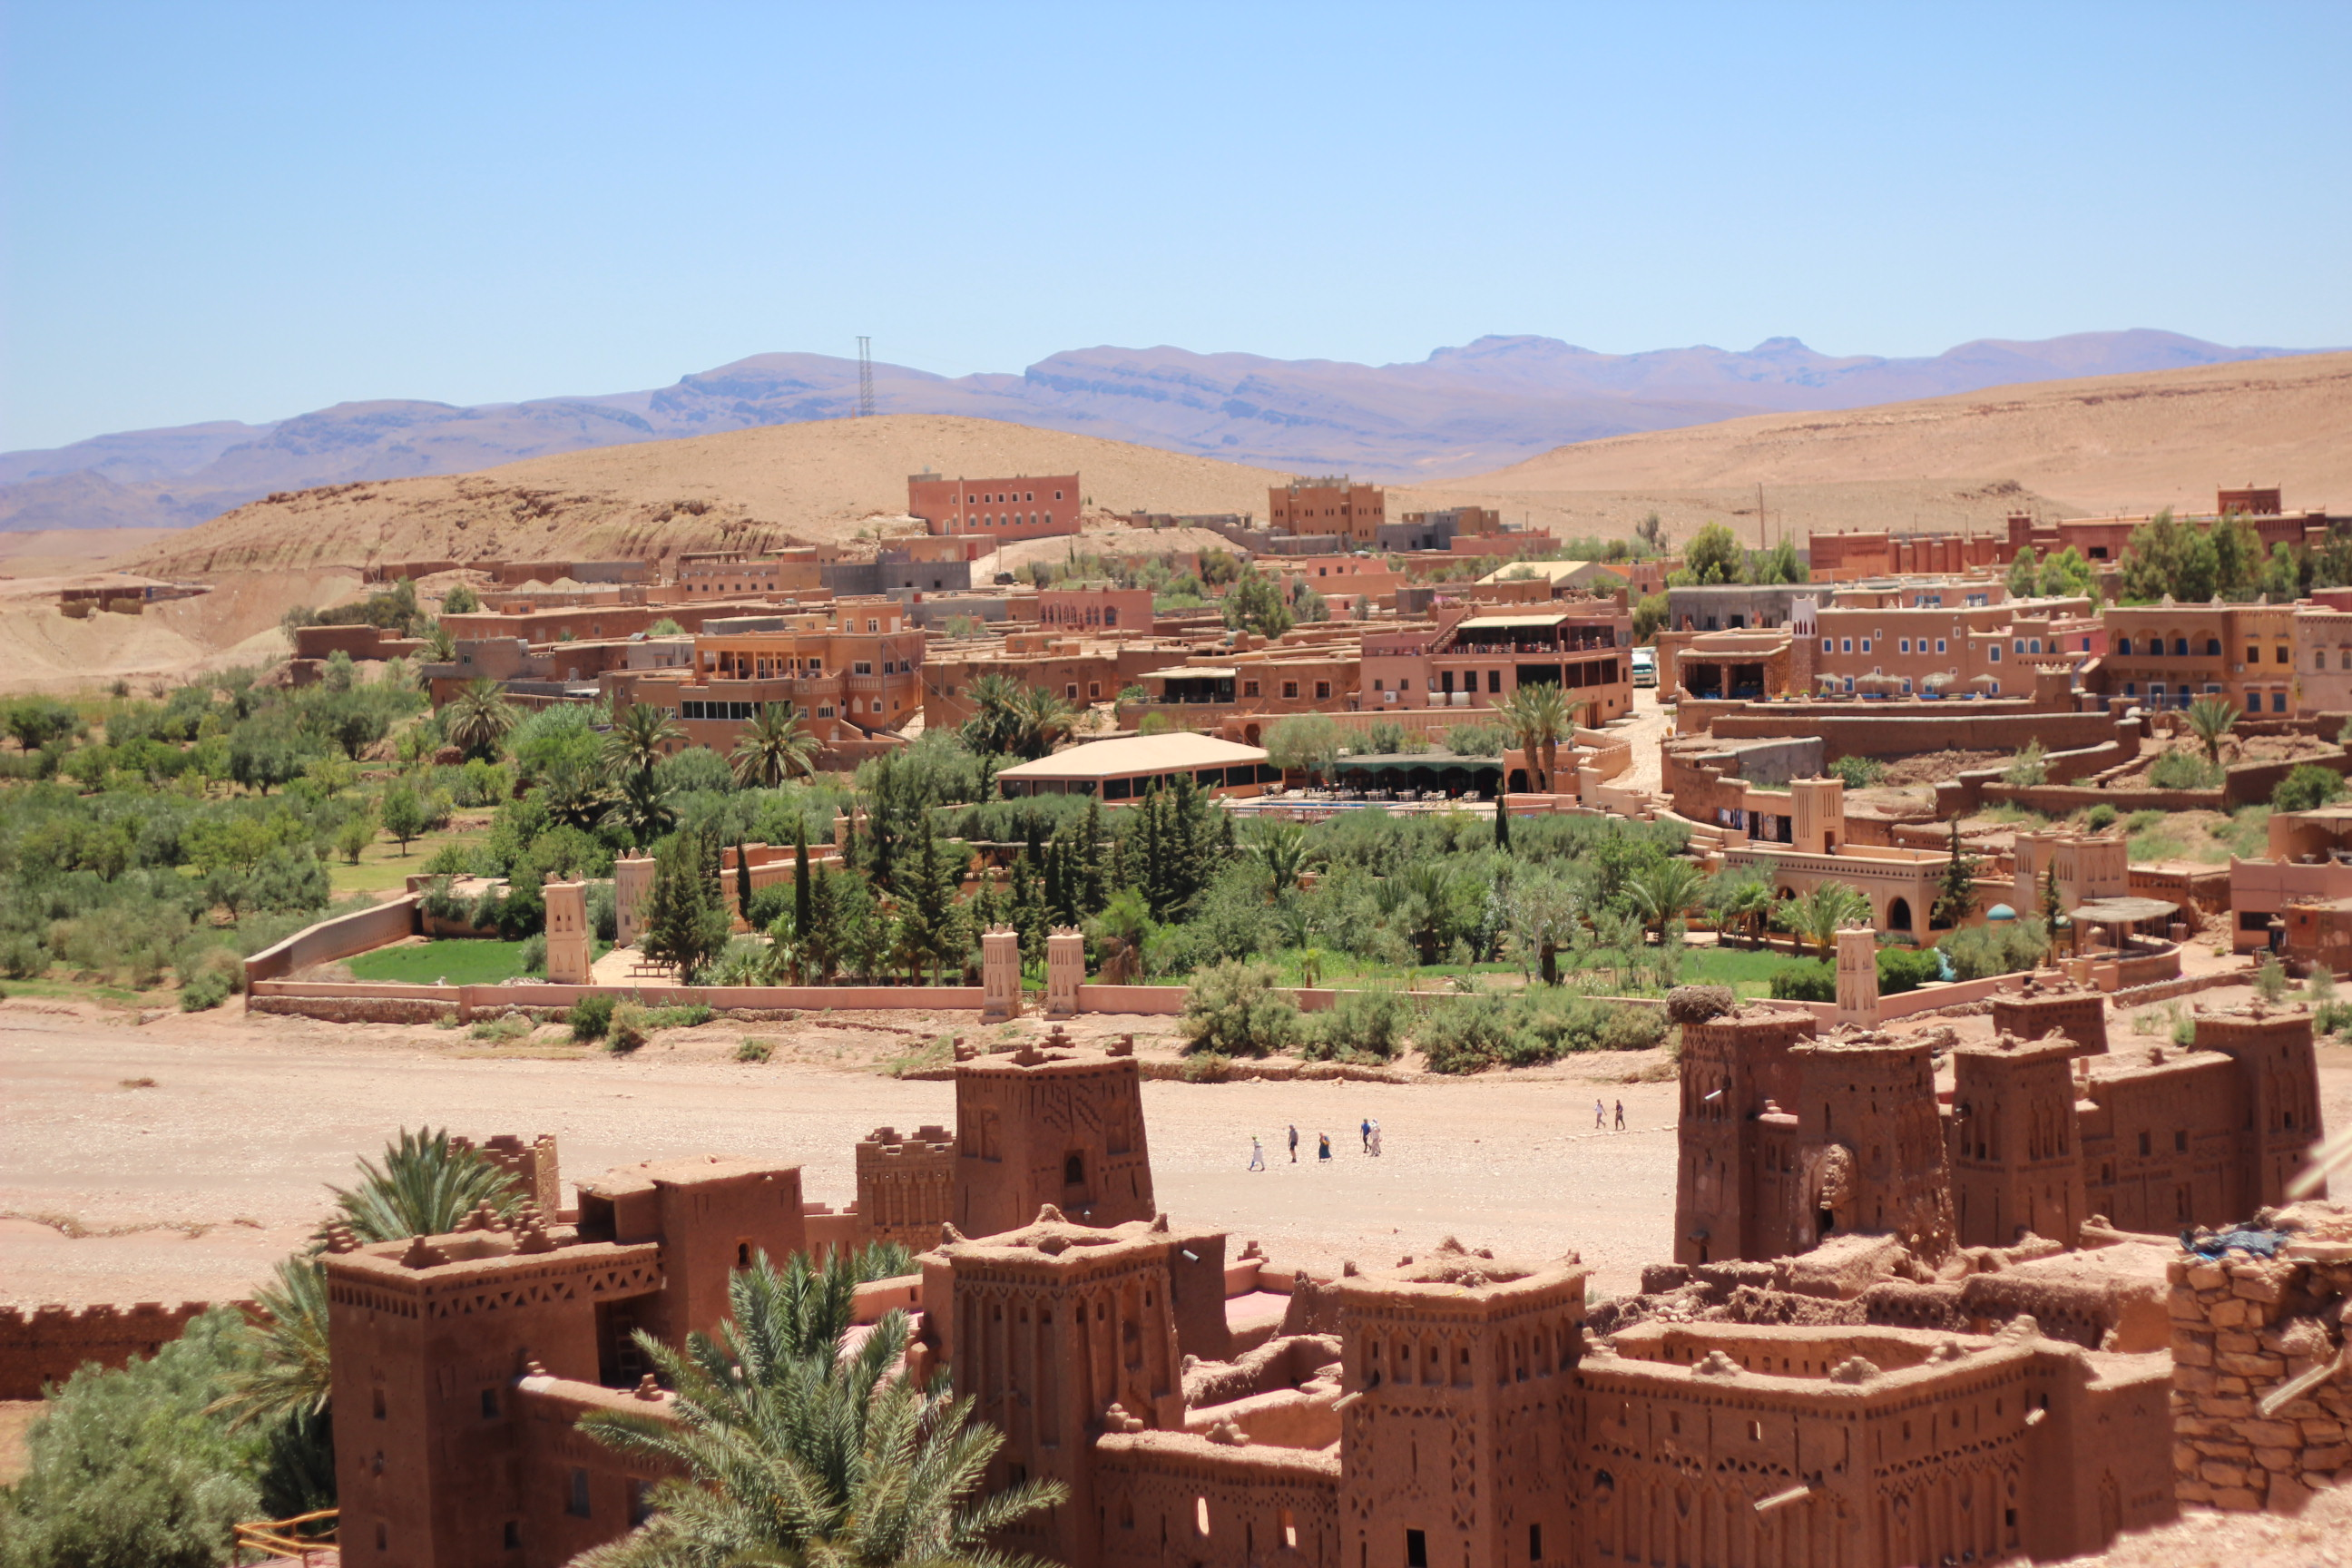 Zwillingsratgeber IMG_5896 Marokko Urlaub - Zwei Frauen unterwegs